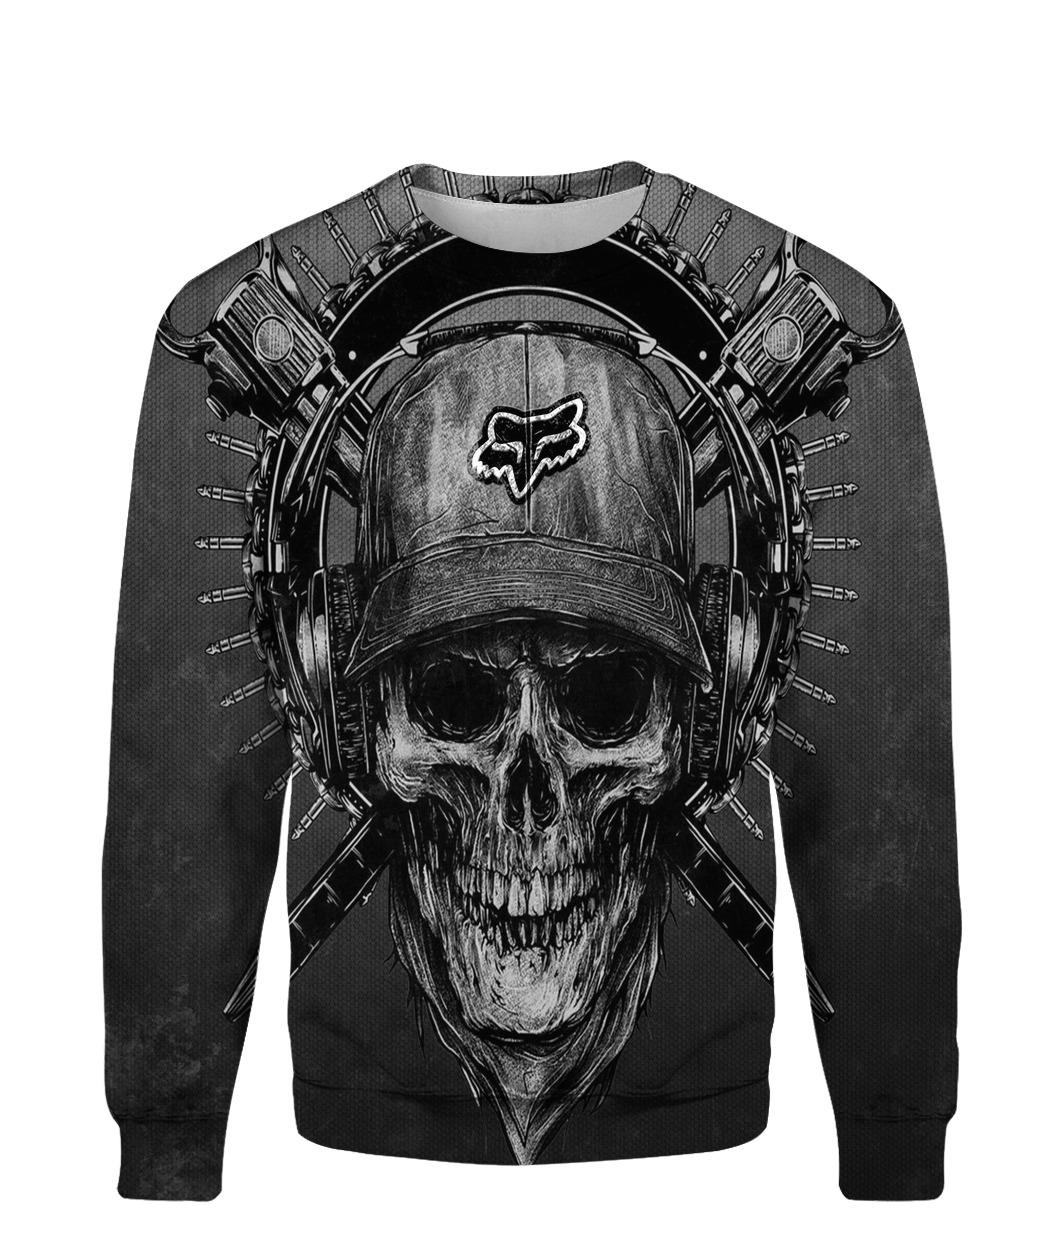 Terror noise division fox racing all over print sweatshirt